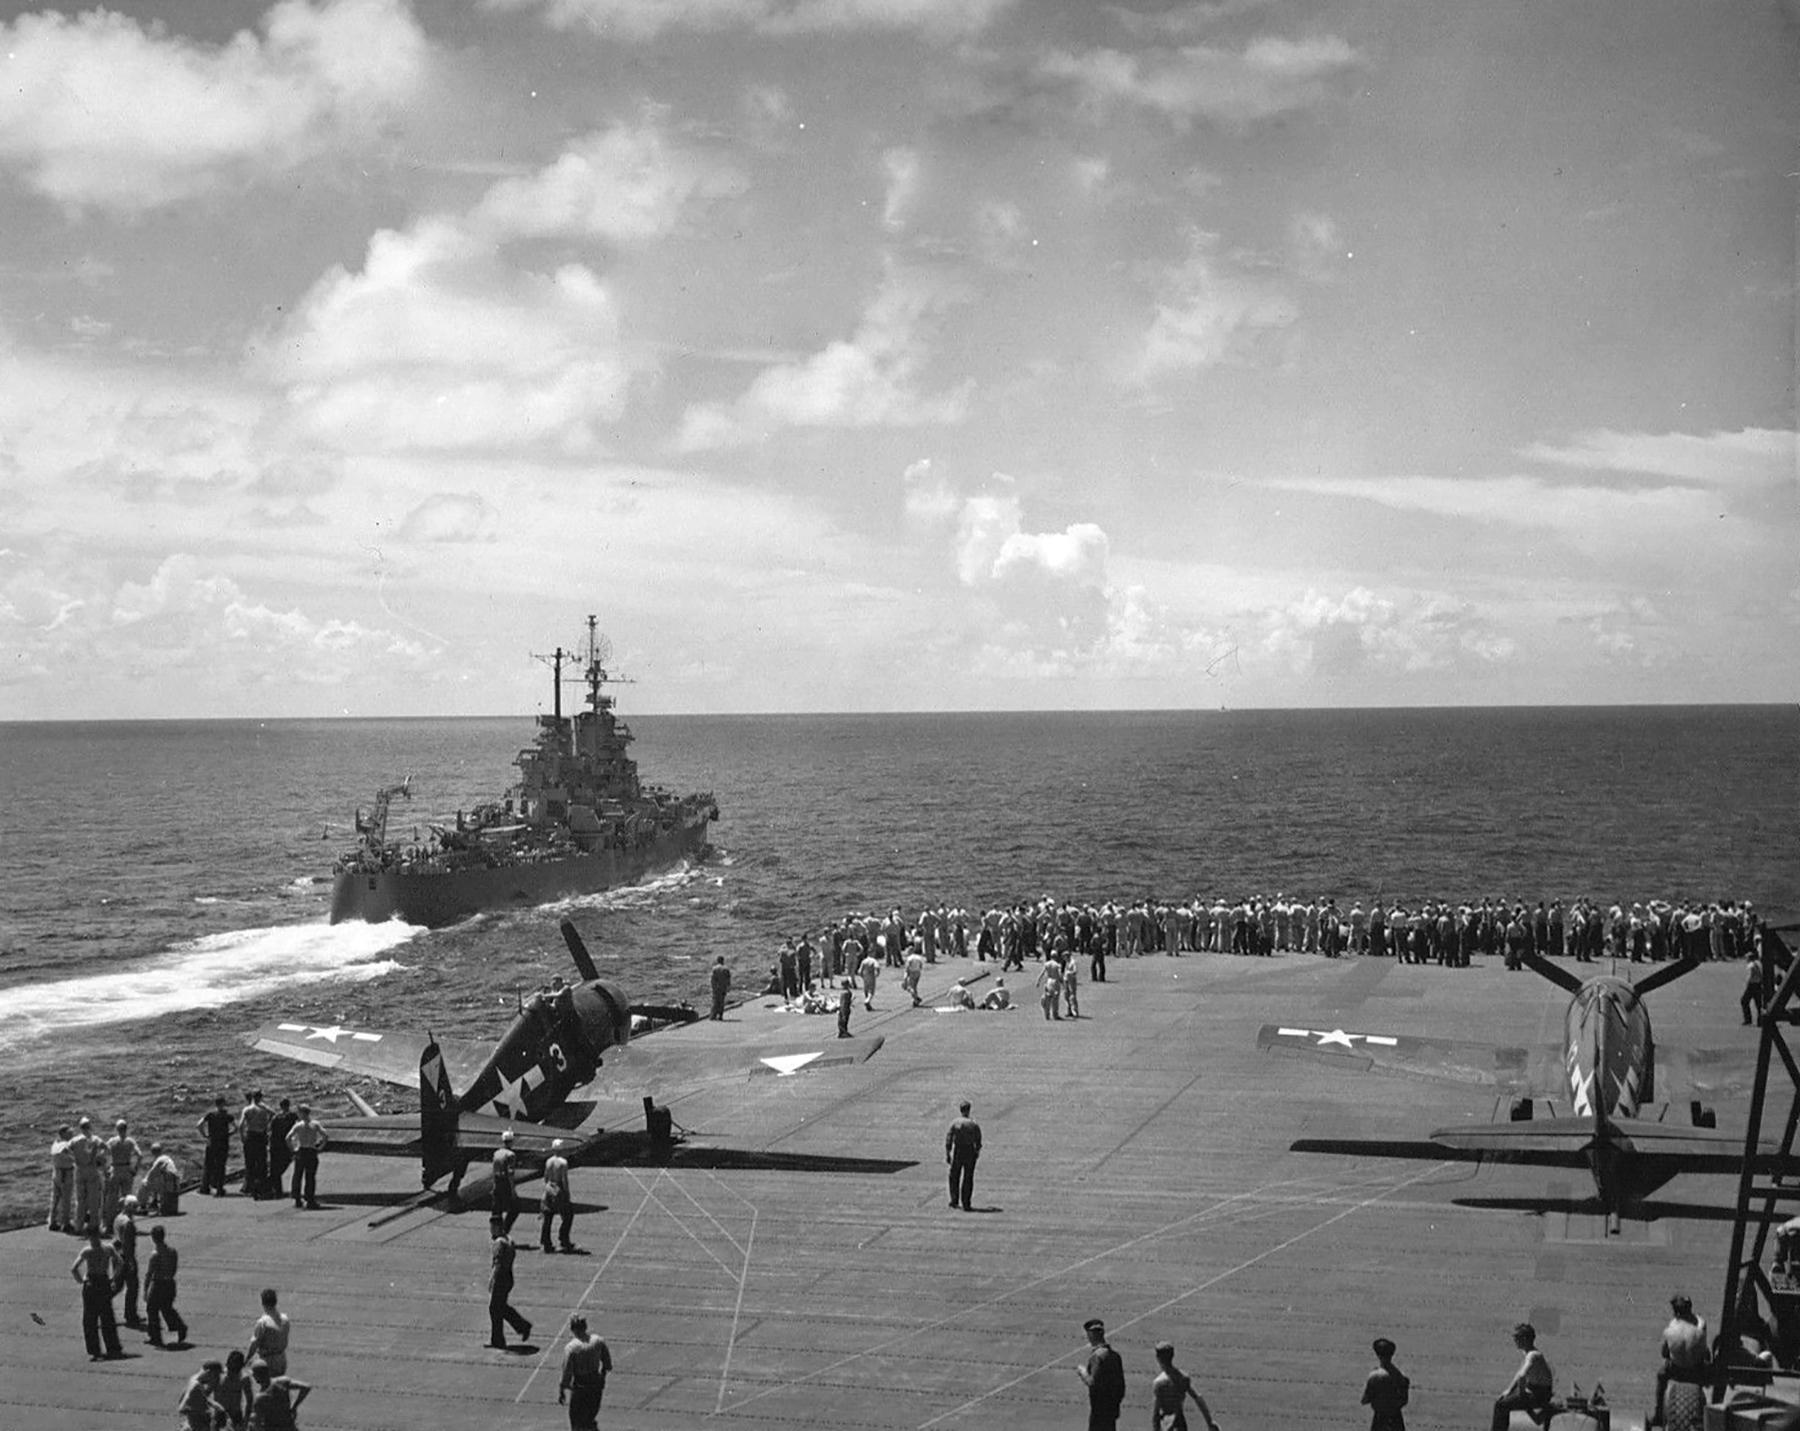 Grumman F6F 5 Hellcat VBF 87 White 3 aboard CV 14 USS Ticonderoga June 1945 ebay 01